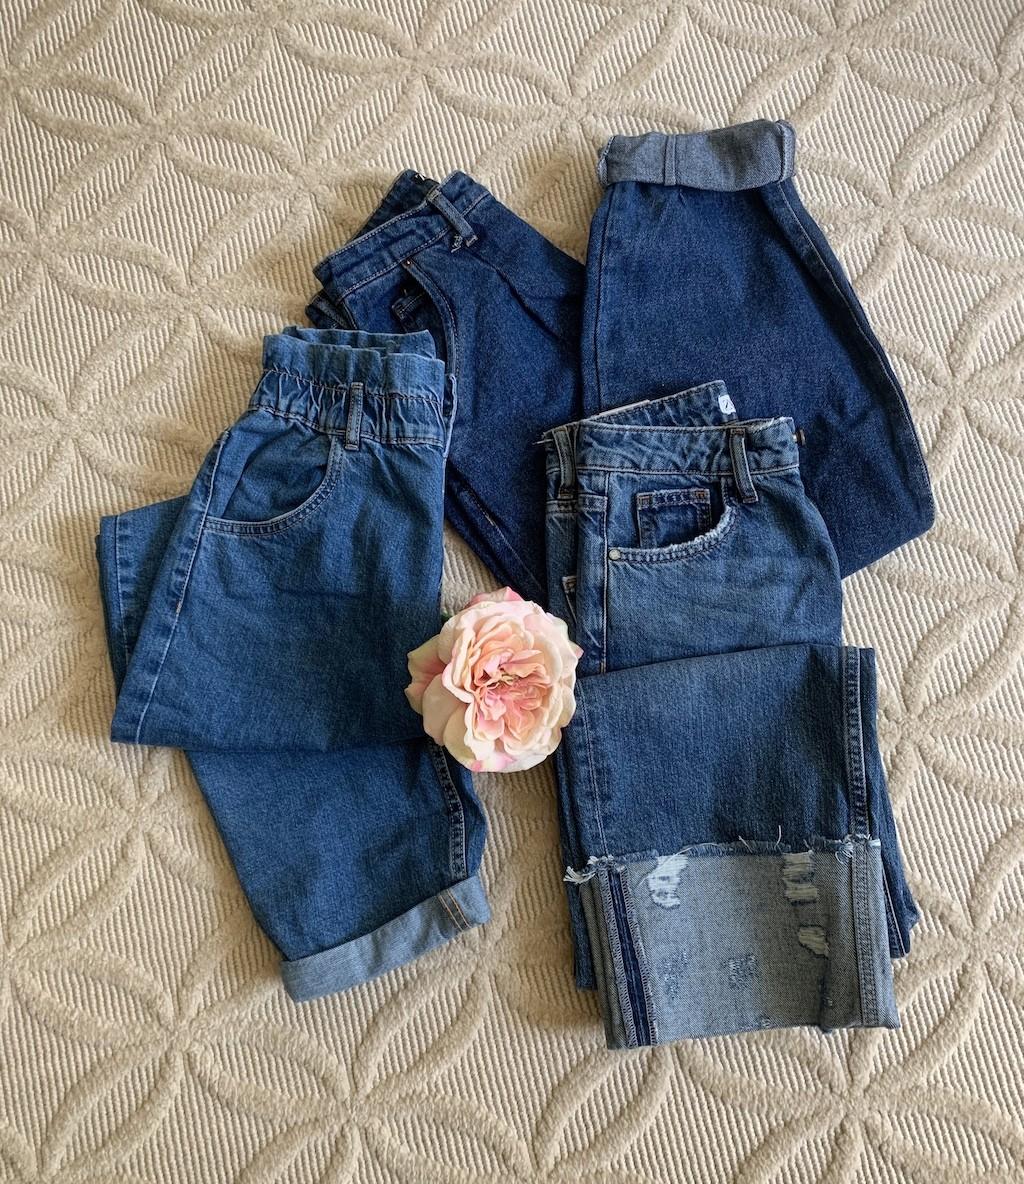 Zara-jeans